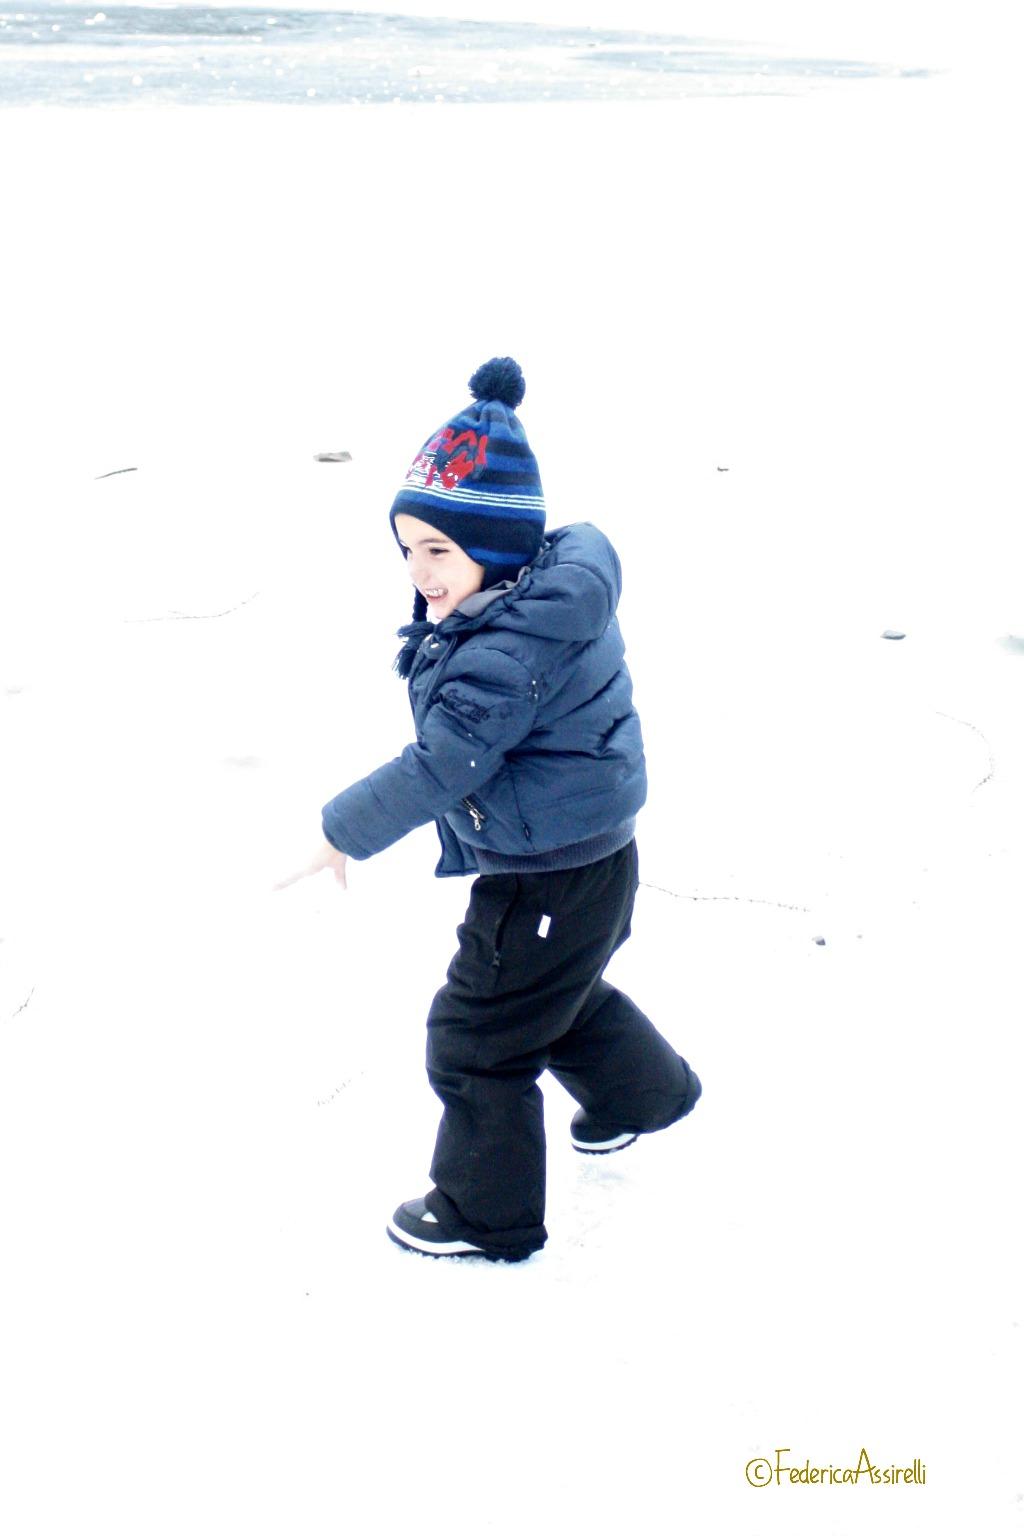 Felice sulla neve